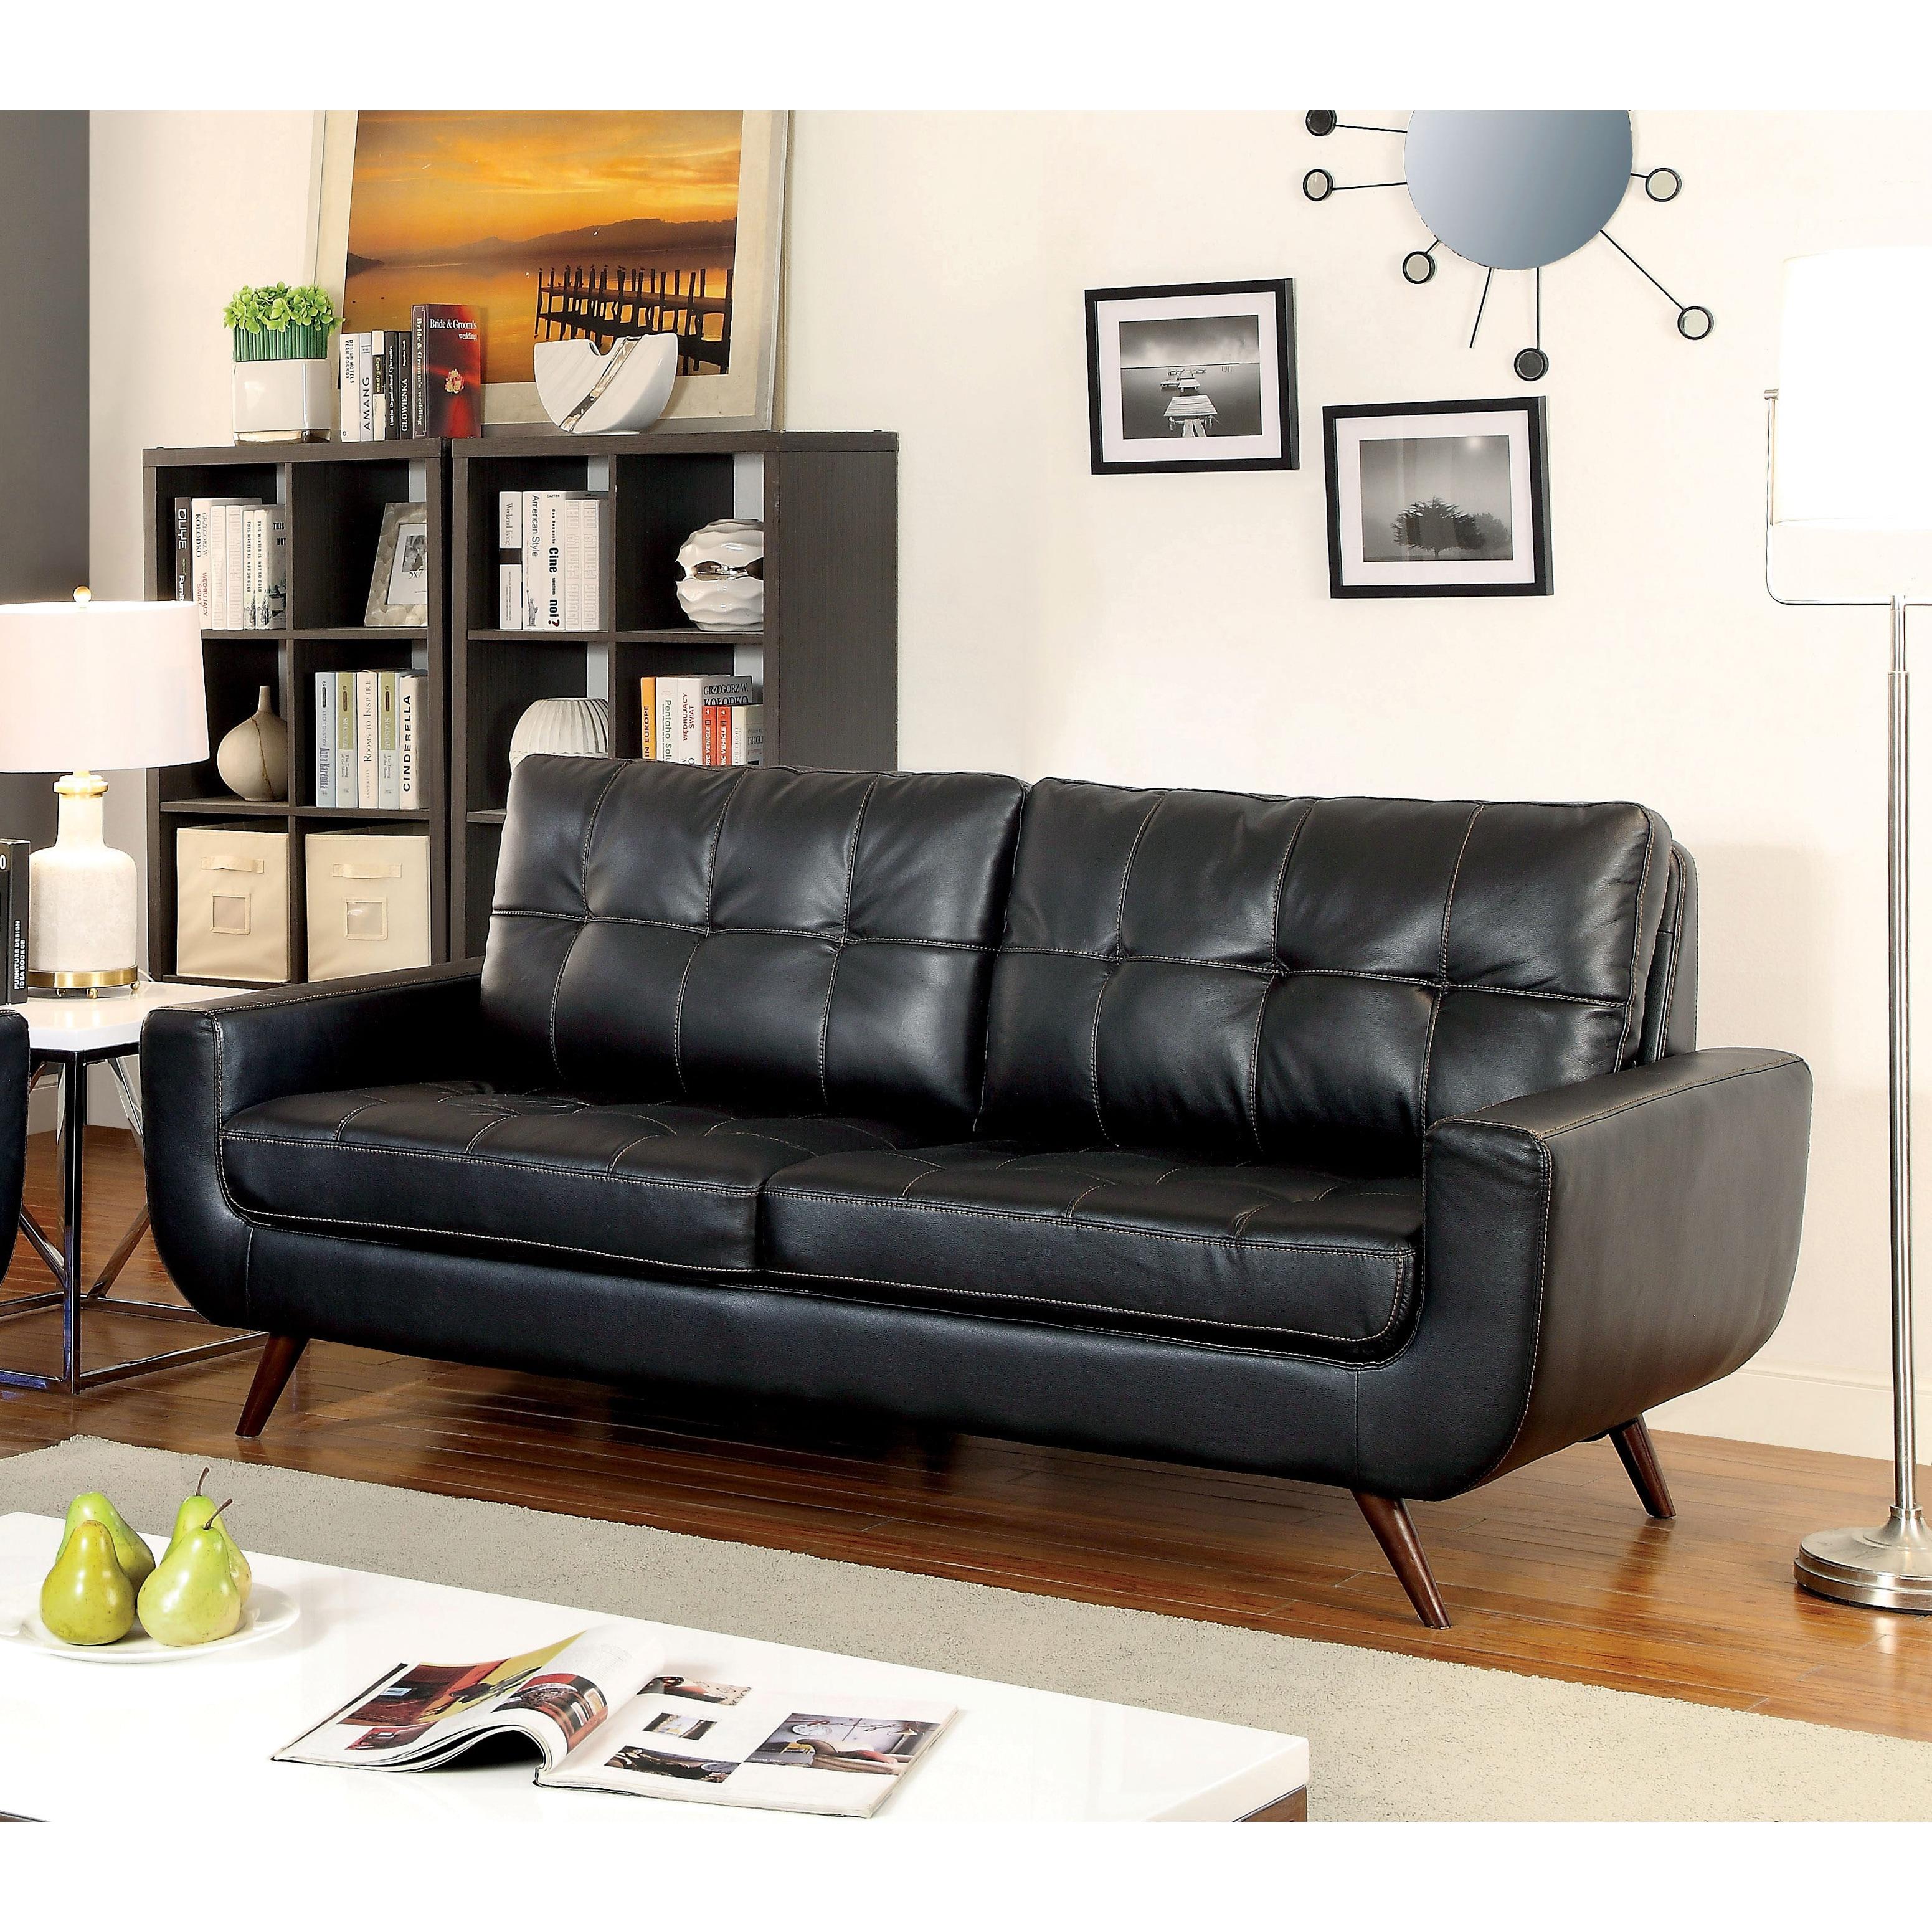 Furniture Of America Garcia Mid Century Modern Tufted Leather Gel Black Sofa